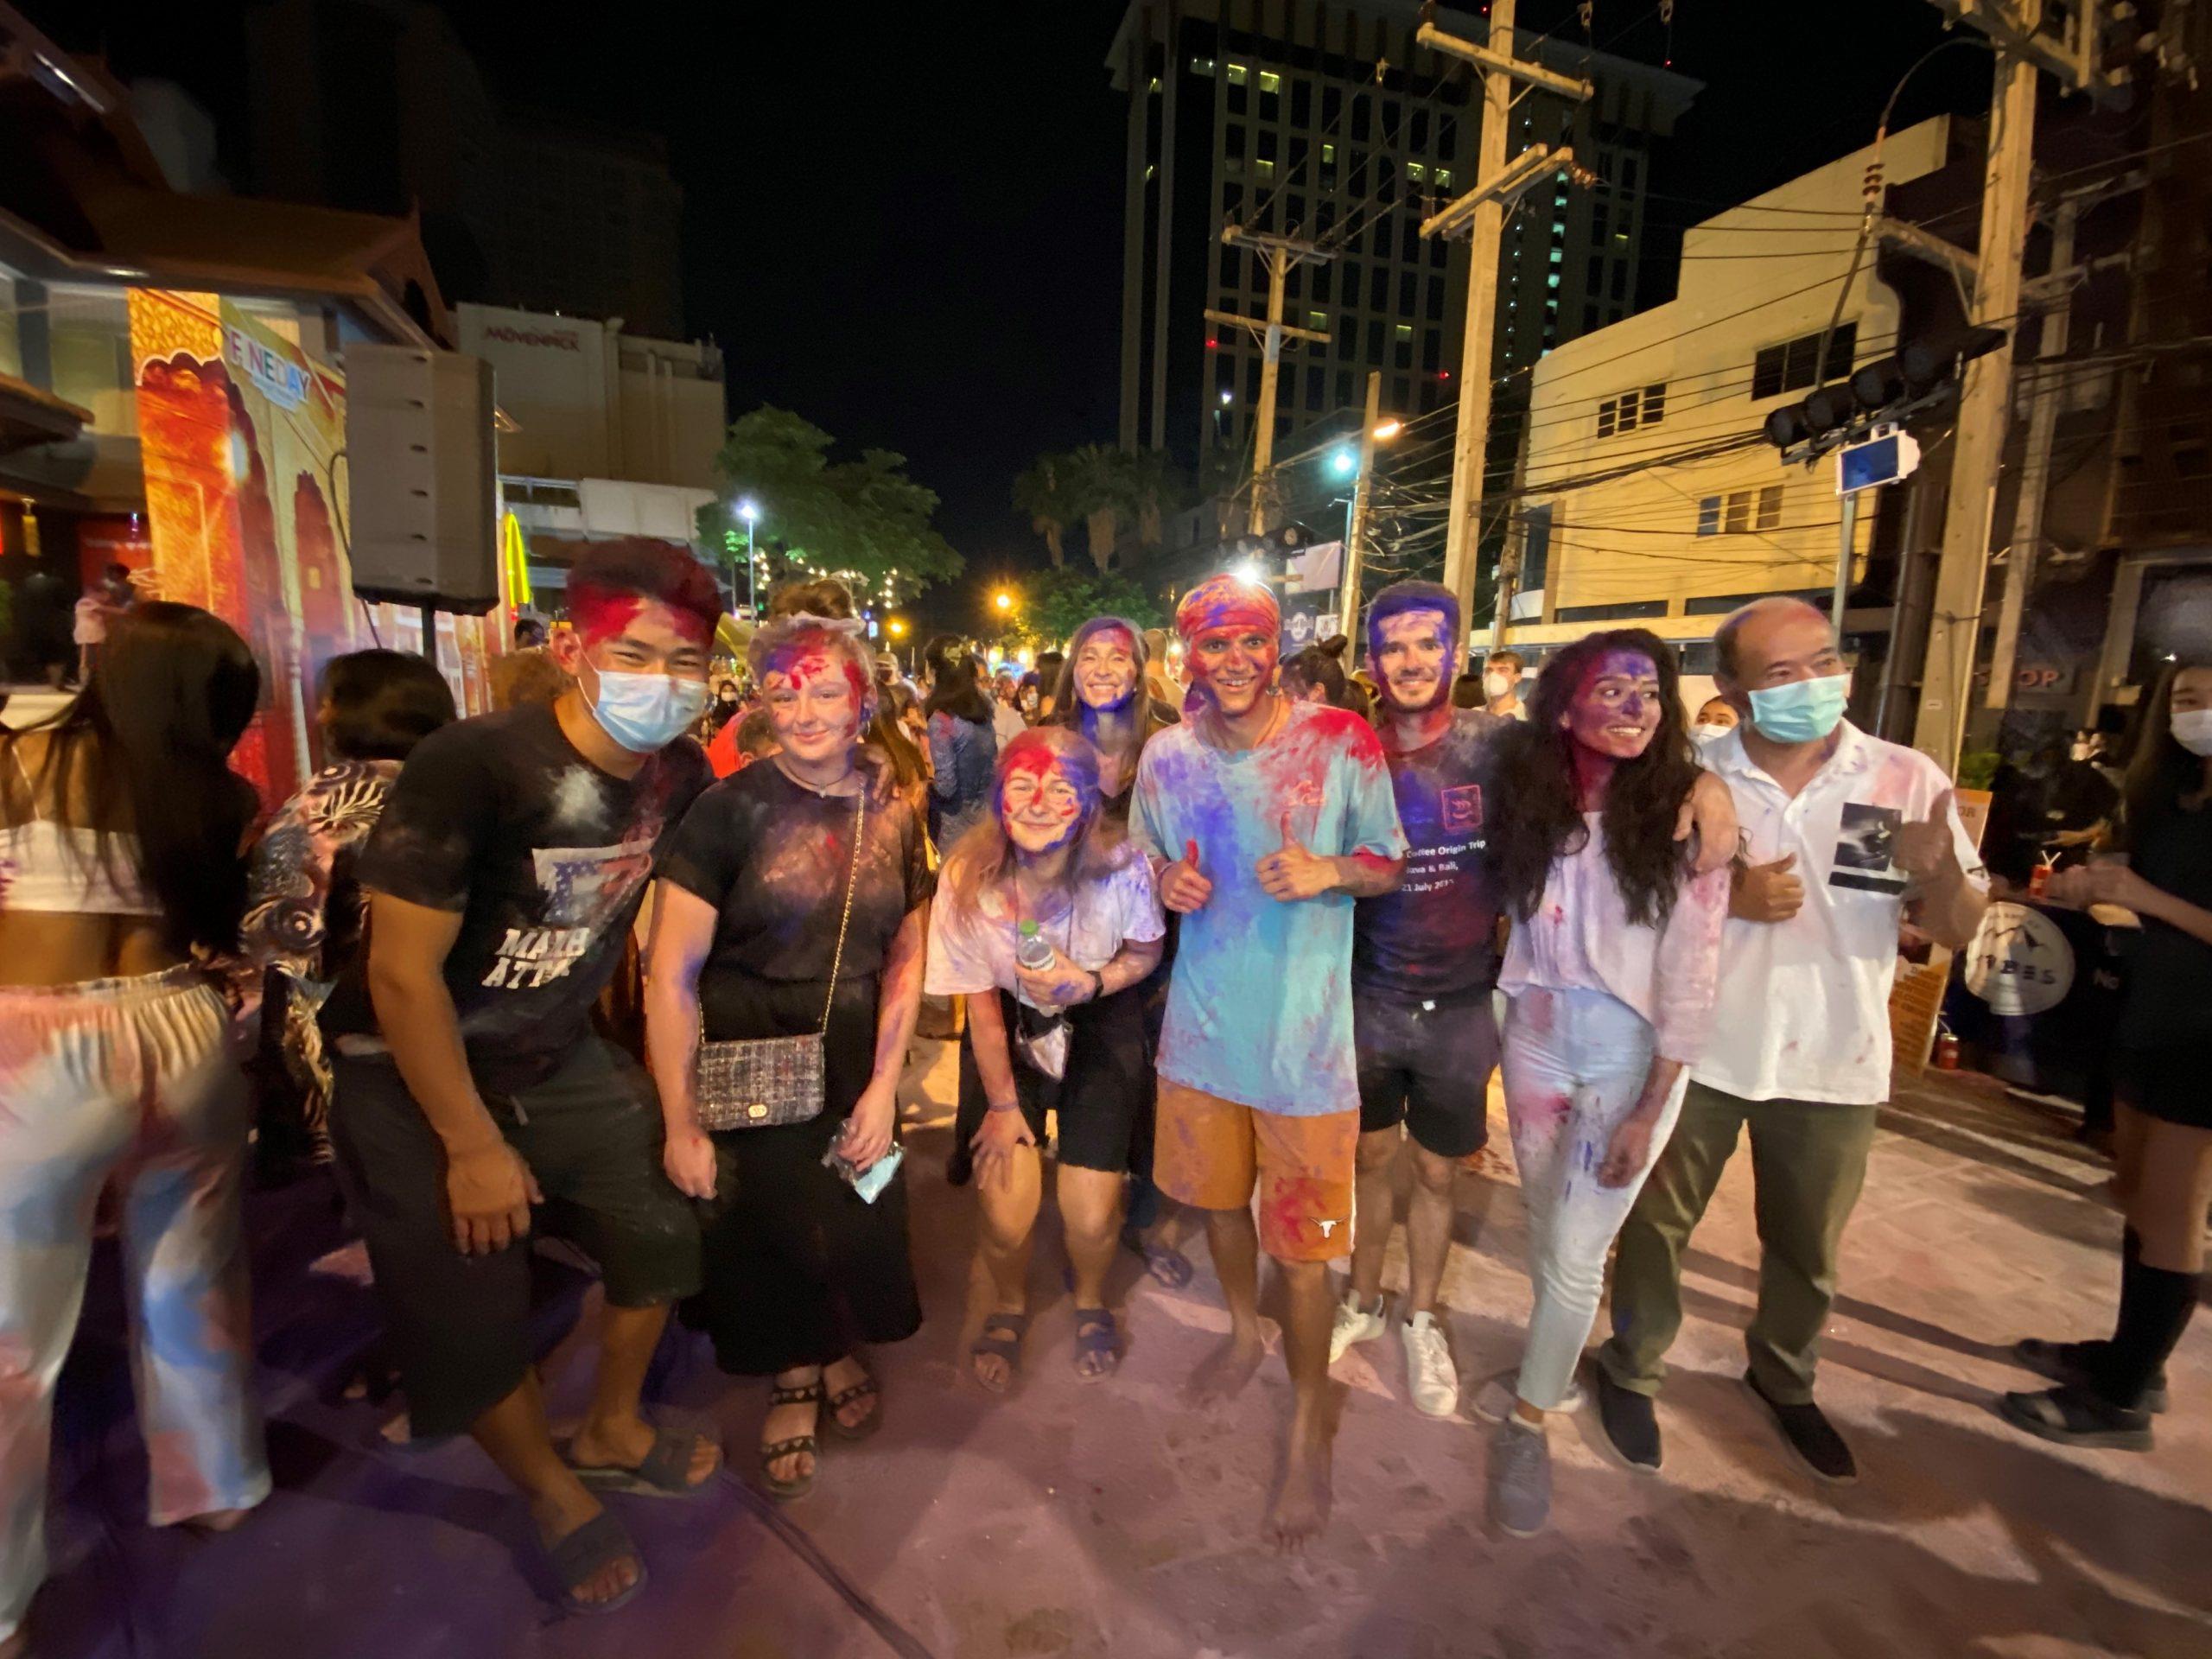 Eglė draugų būryje Chiang Mai švenčia Holi šventę